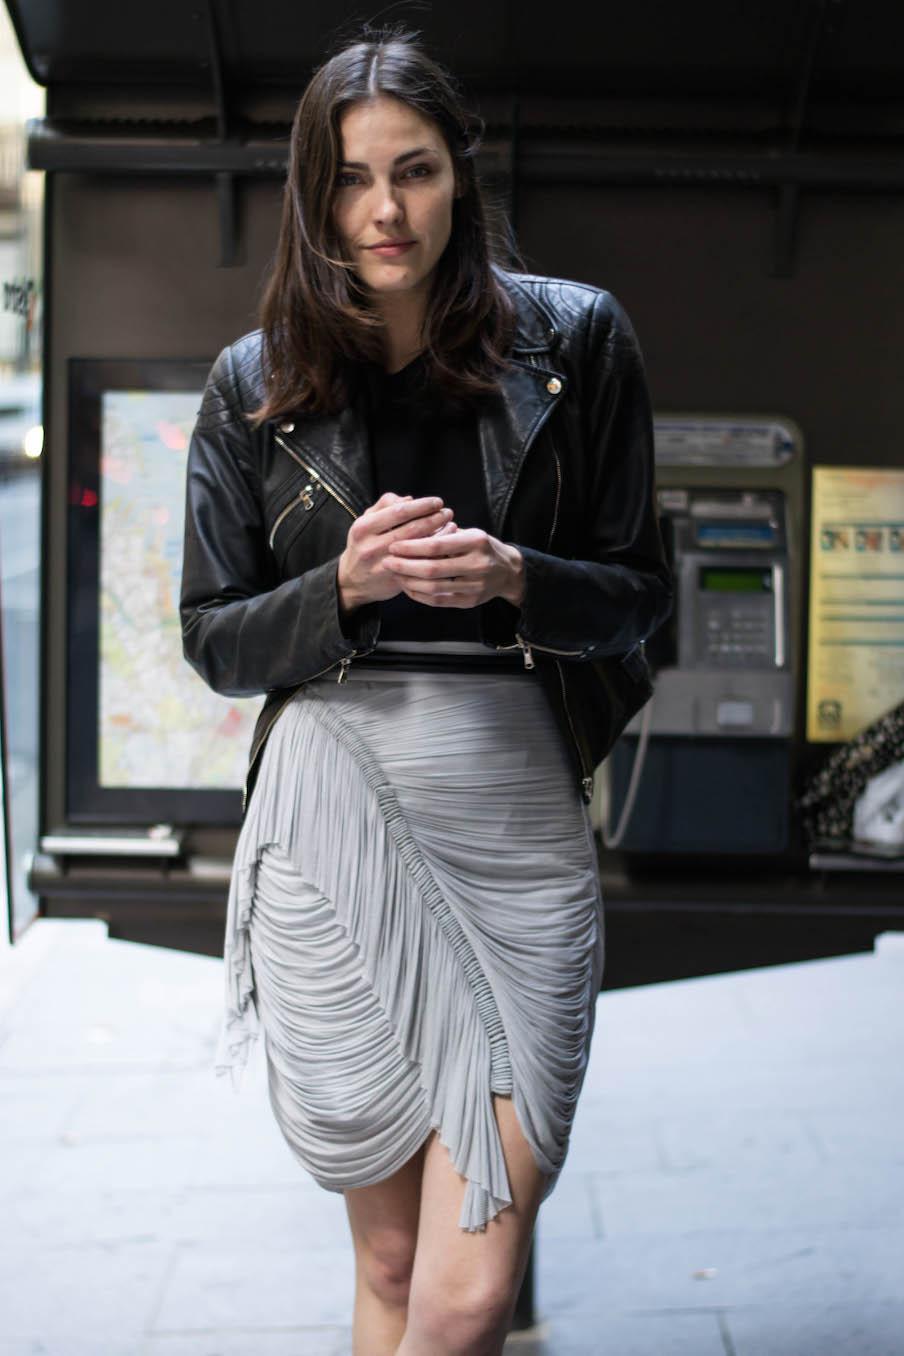 "NSW: Lola Van Vorst, Willow manager, Sydney CBD.""My style's tomboy with a feminine edge."" Photo: Alice Scriberras"